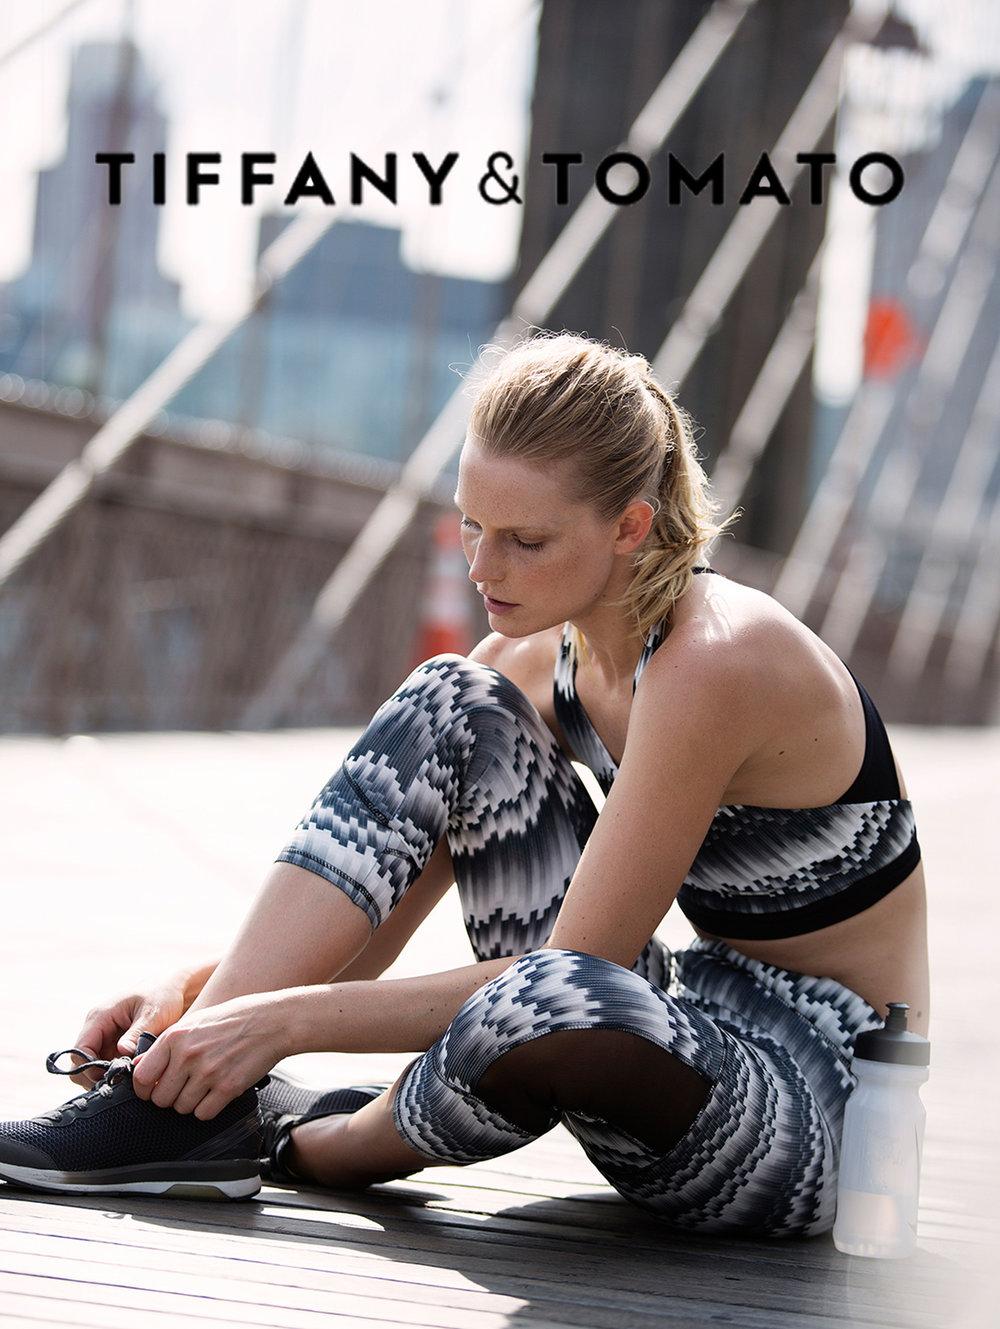 Tiffany & TomatoActivewear -